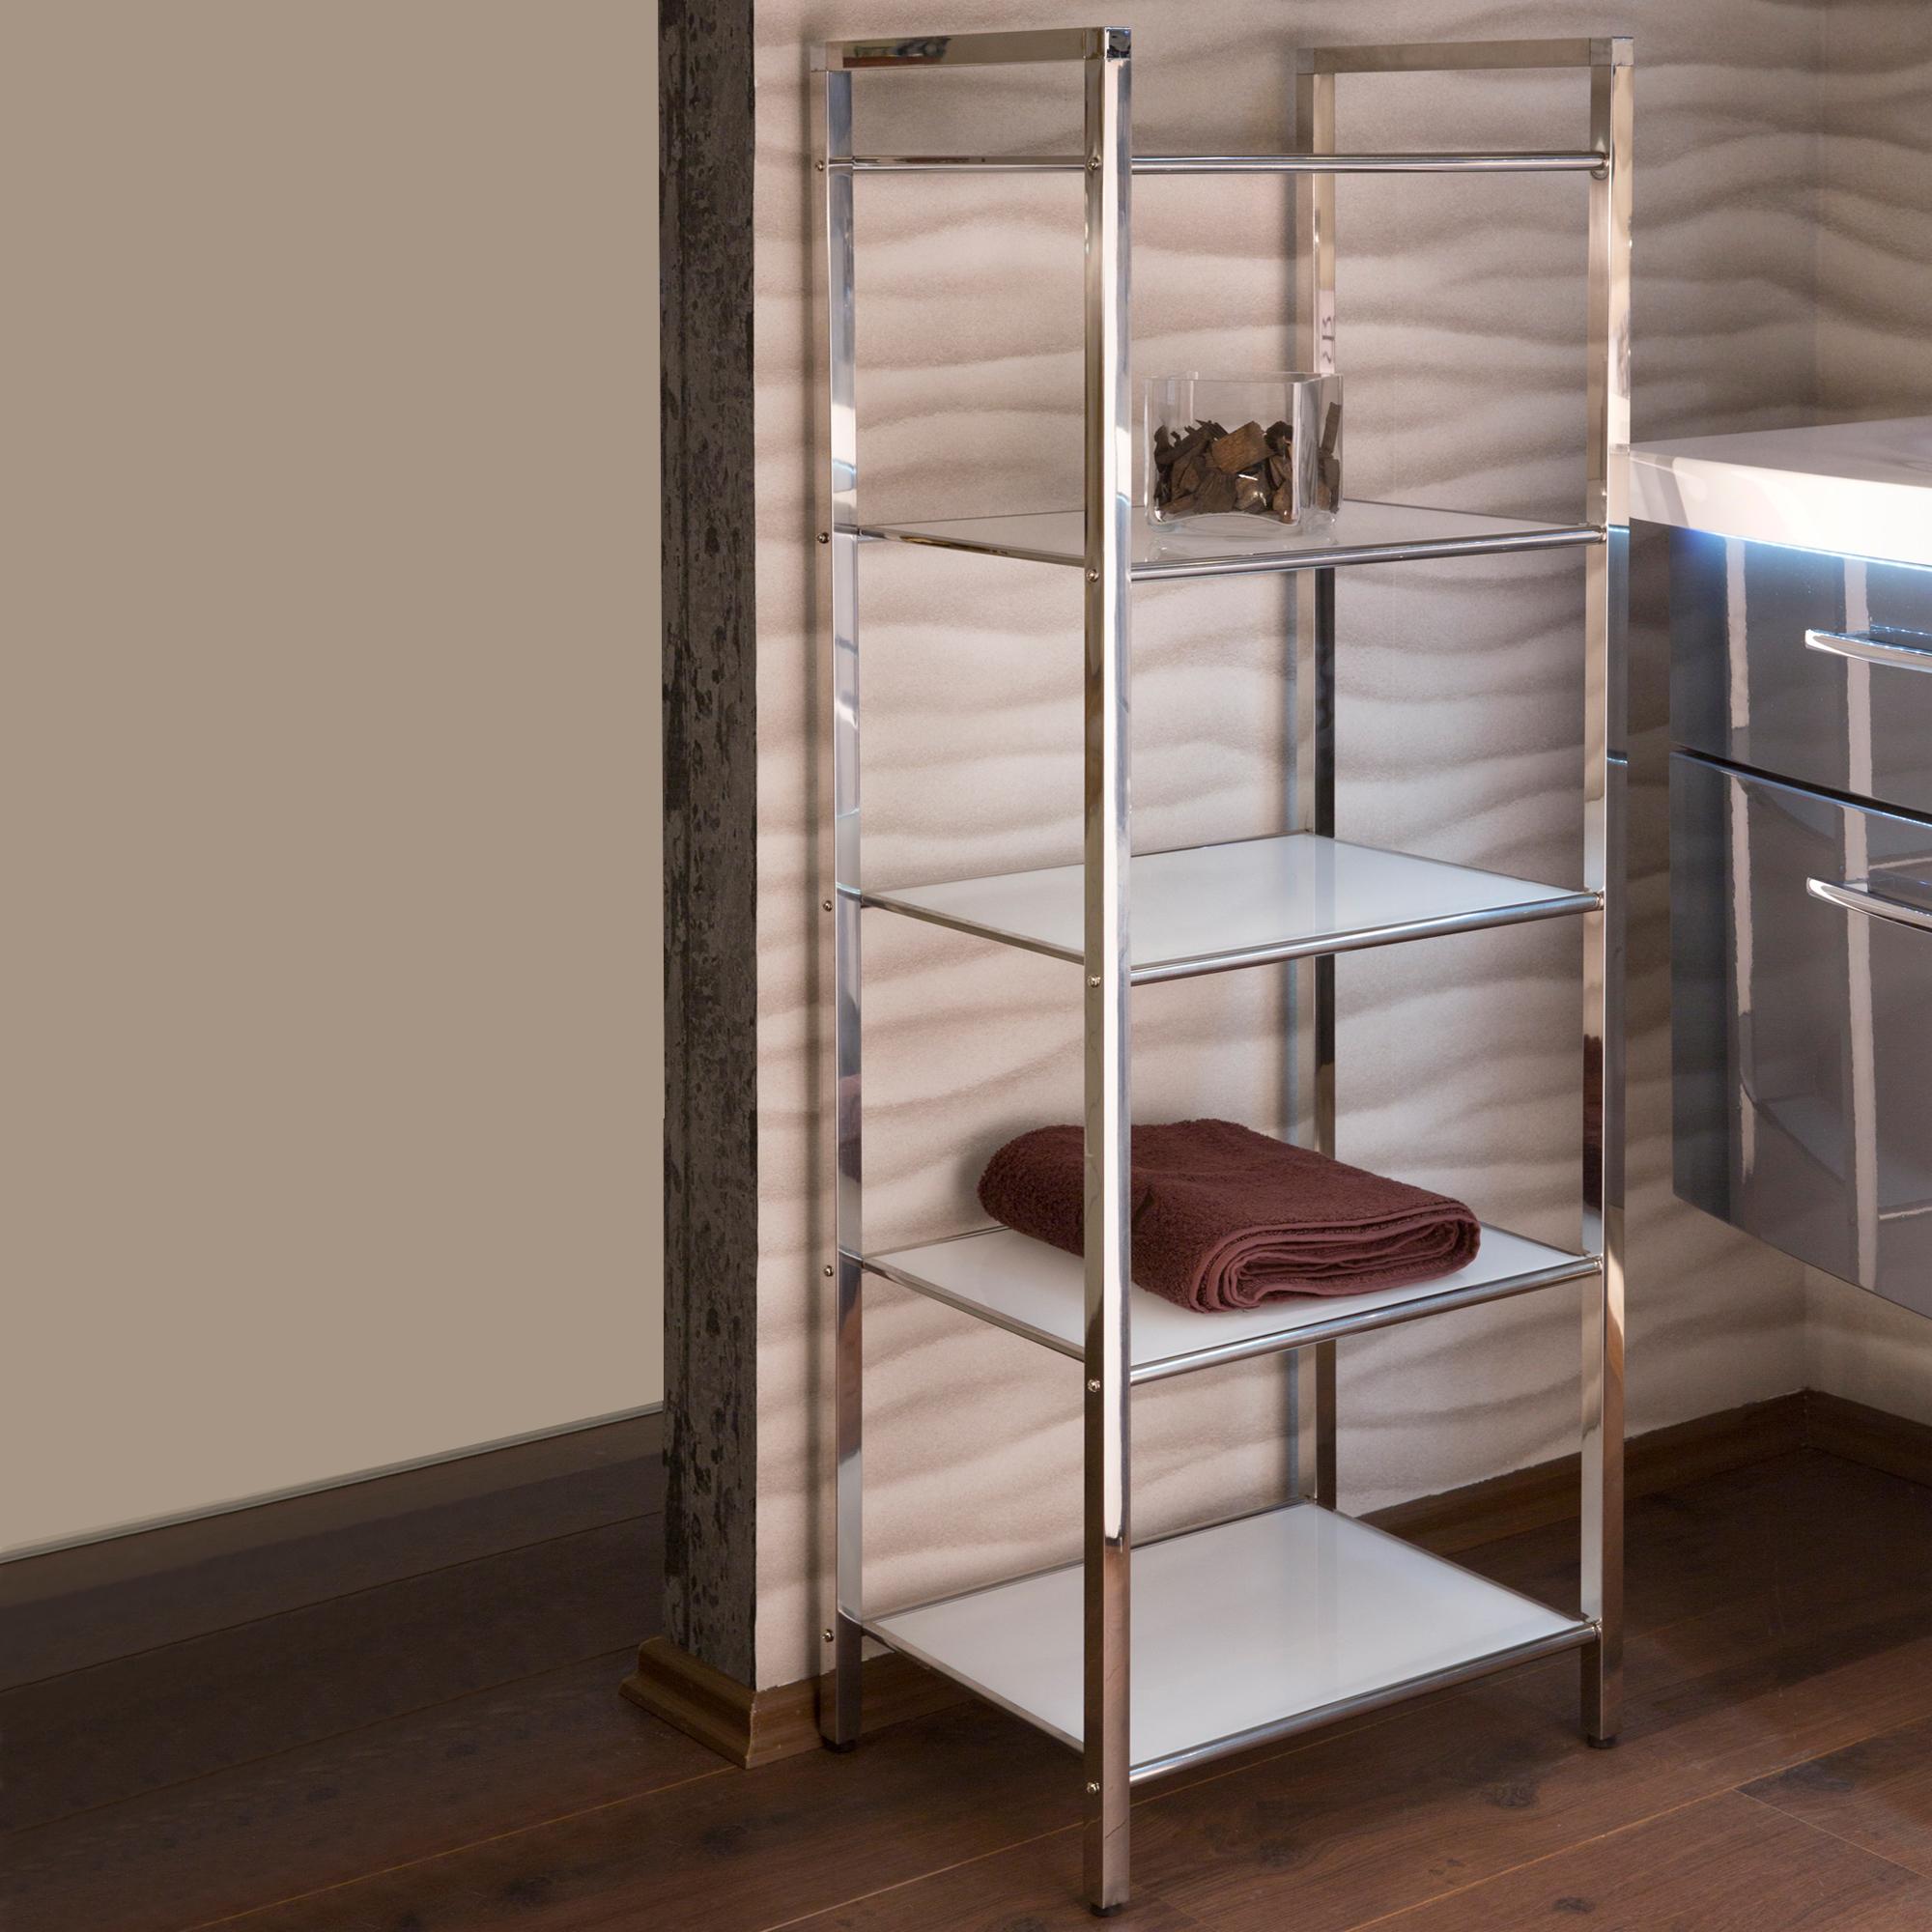 regal linda mit 5 glasb den 30 x 40 cm edelstahl wei wohnen regale. Black Bedroom Furniture Sets. Home Design Ideas